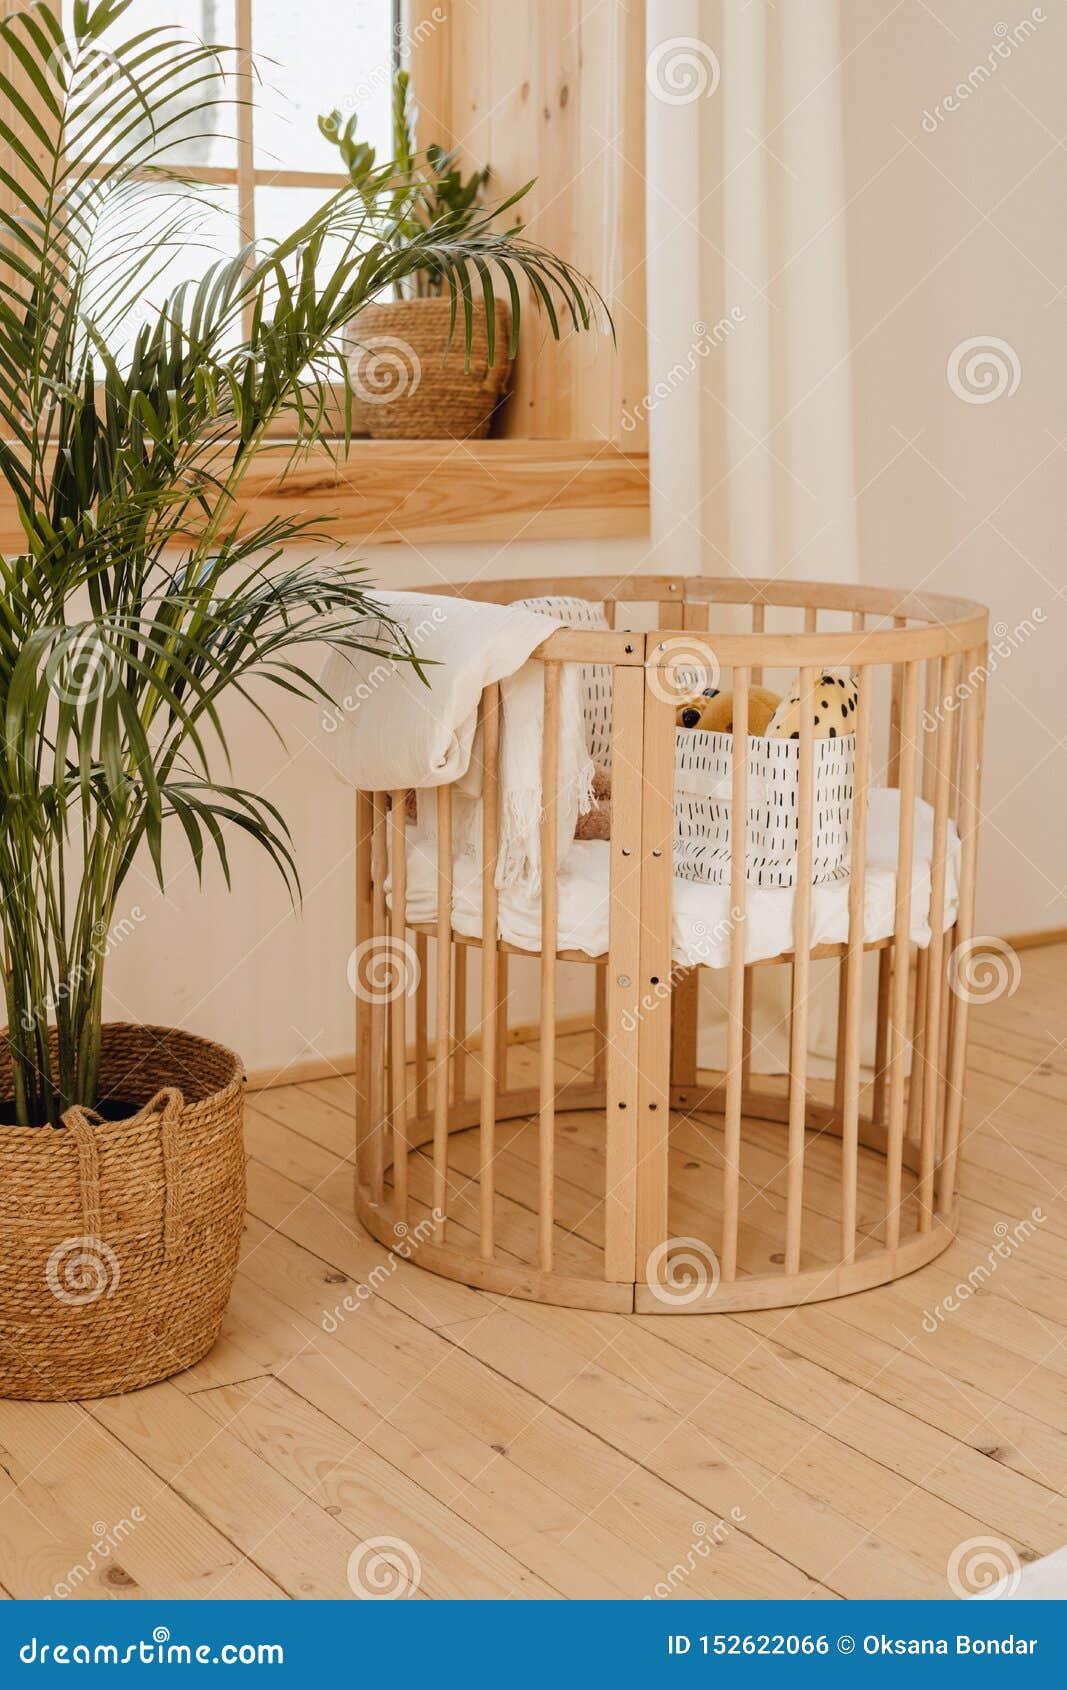 Wooden Baby Bed Crib In Eco Friendly Cozy Interior Stock Photo Image Of Interior Cradle 152622066